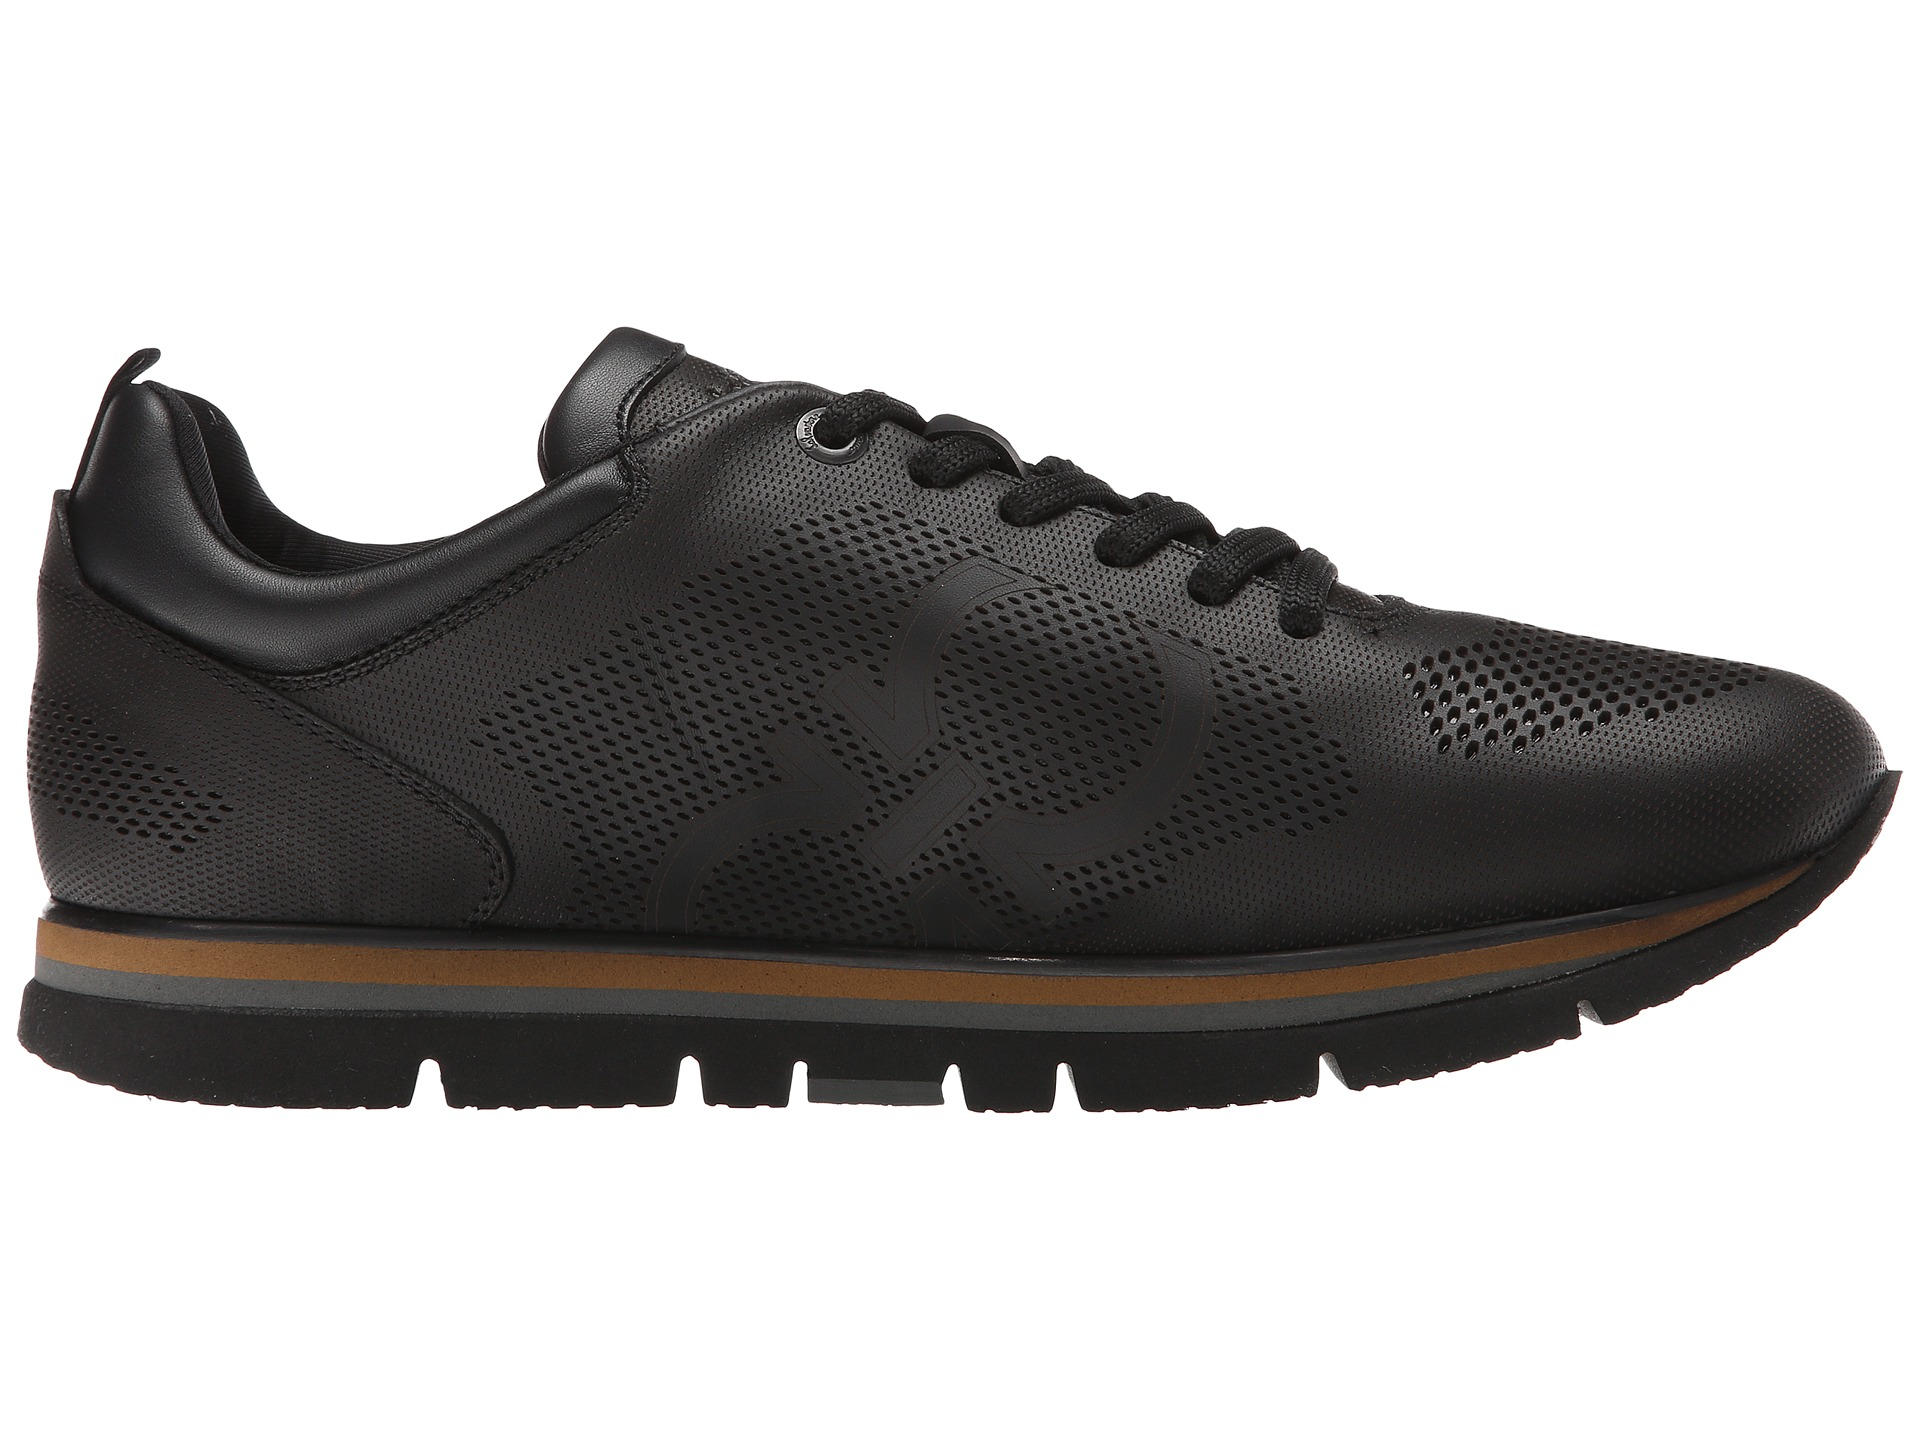 Ferragamo Sneakers 28 Images Ferragamo Low Top Leather